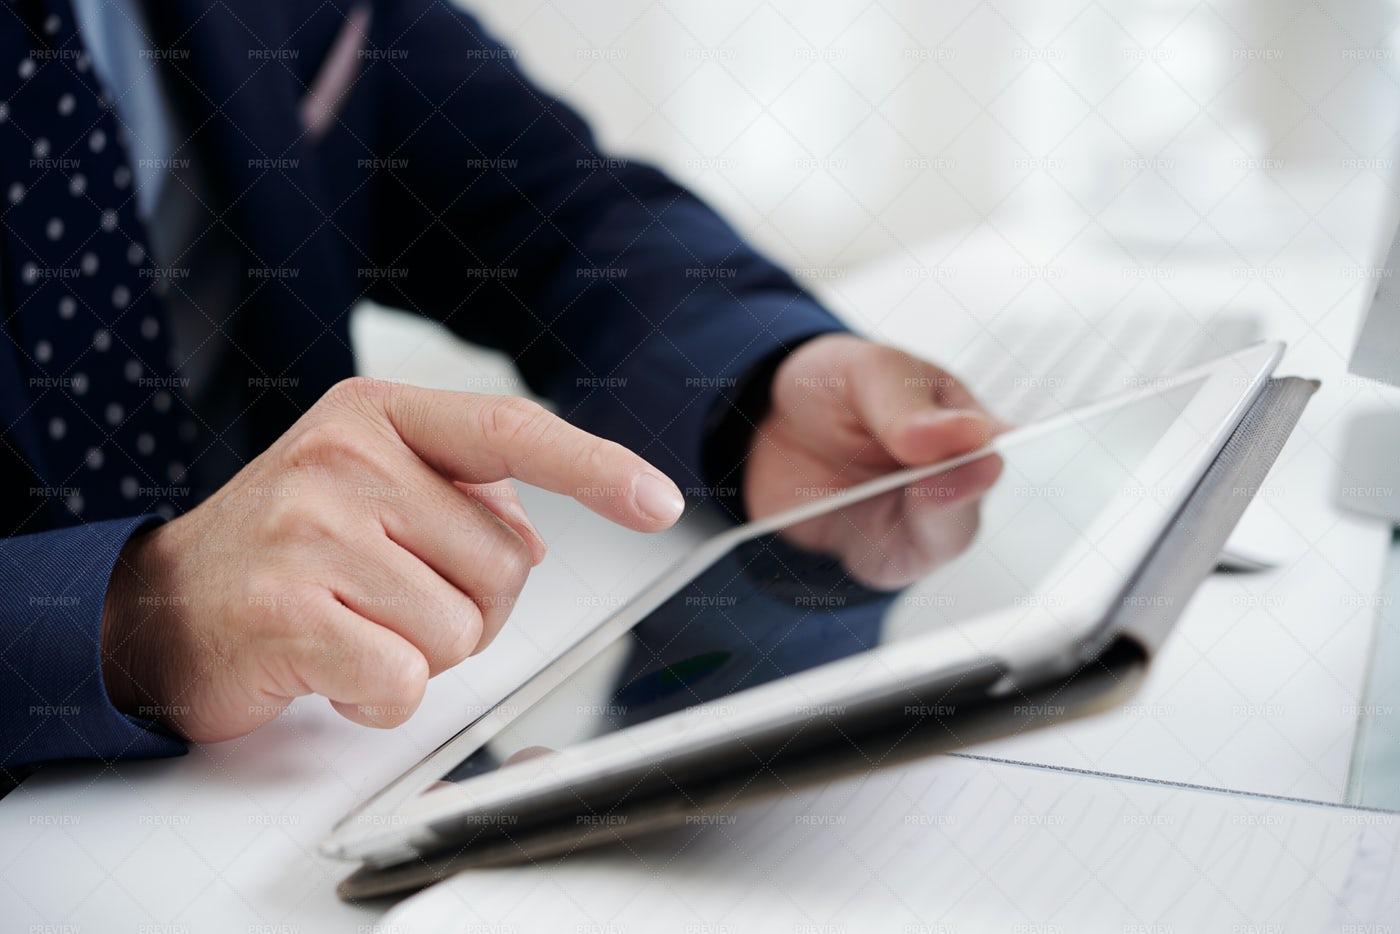 Man Working On Digital Tablet: Stock Photos